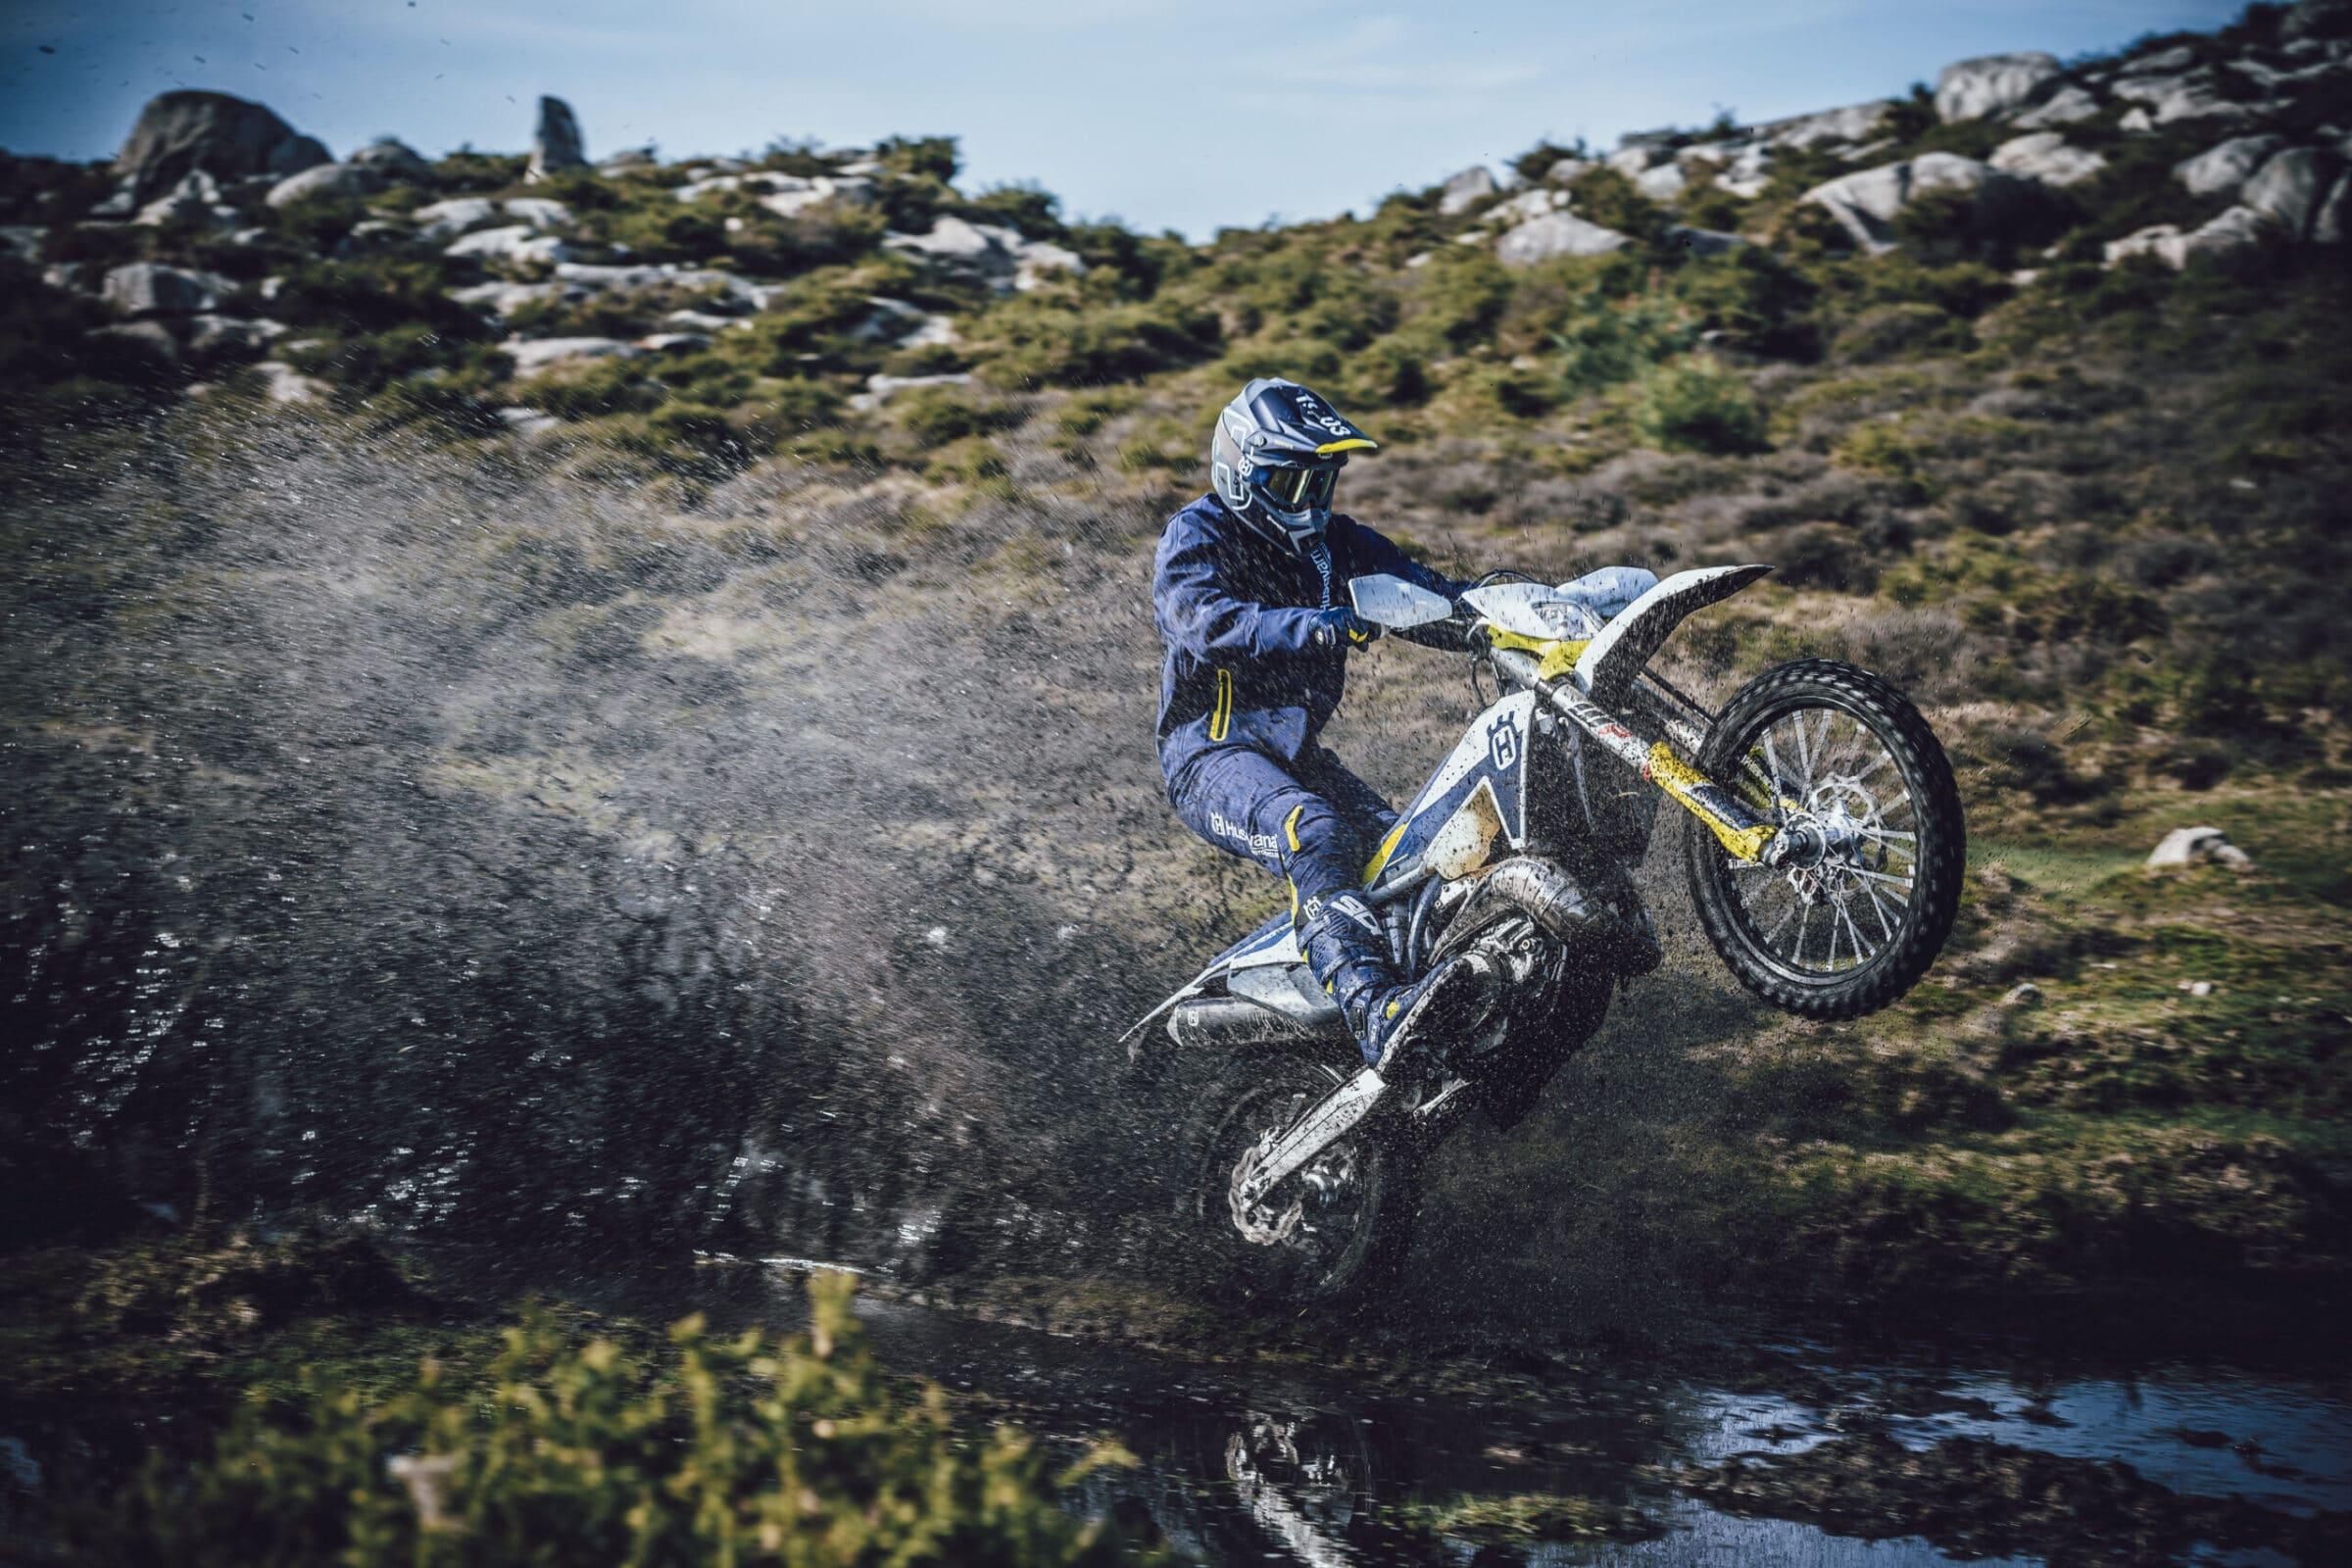 Parts & Accessories - Chris Watson Motorcycles Cessnock & Newcastle